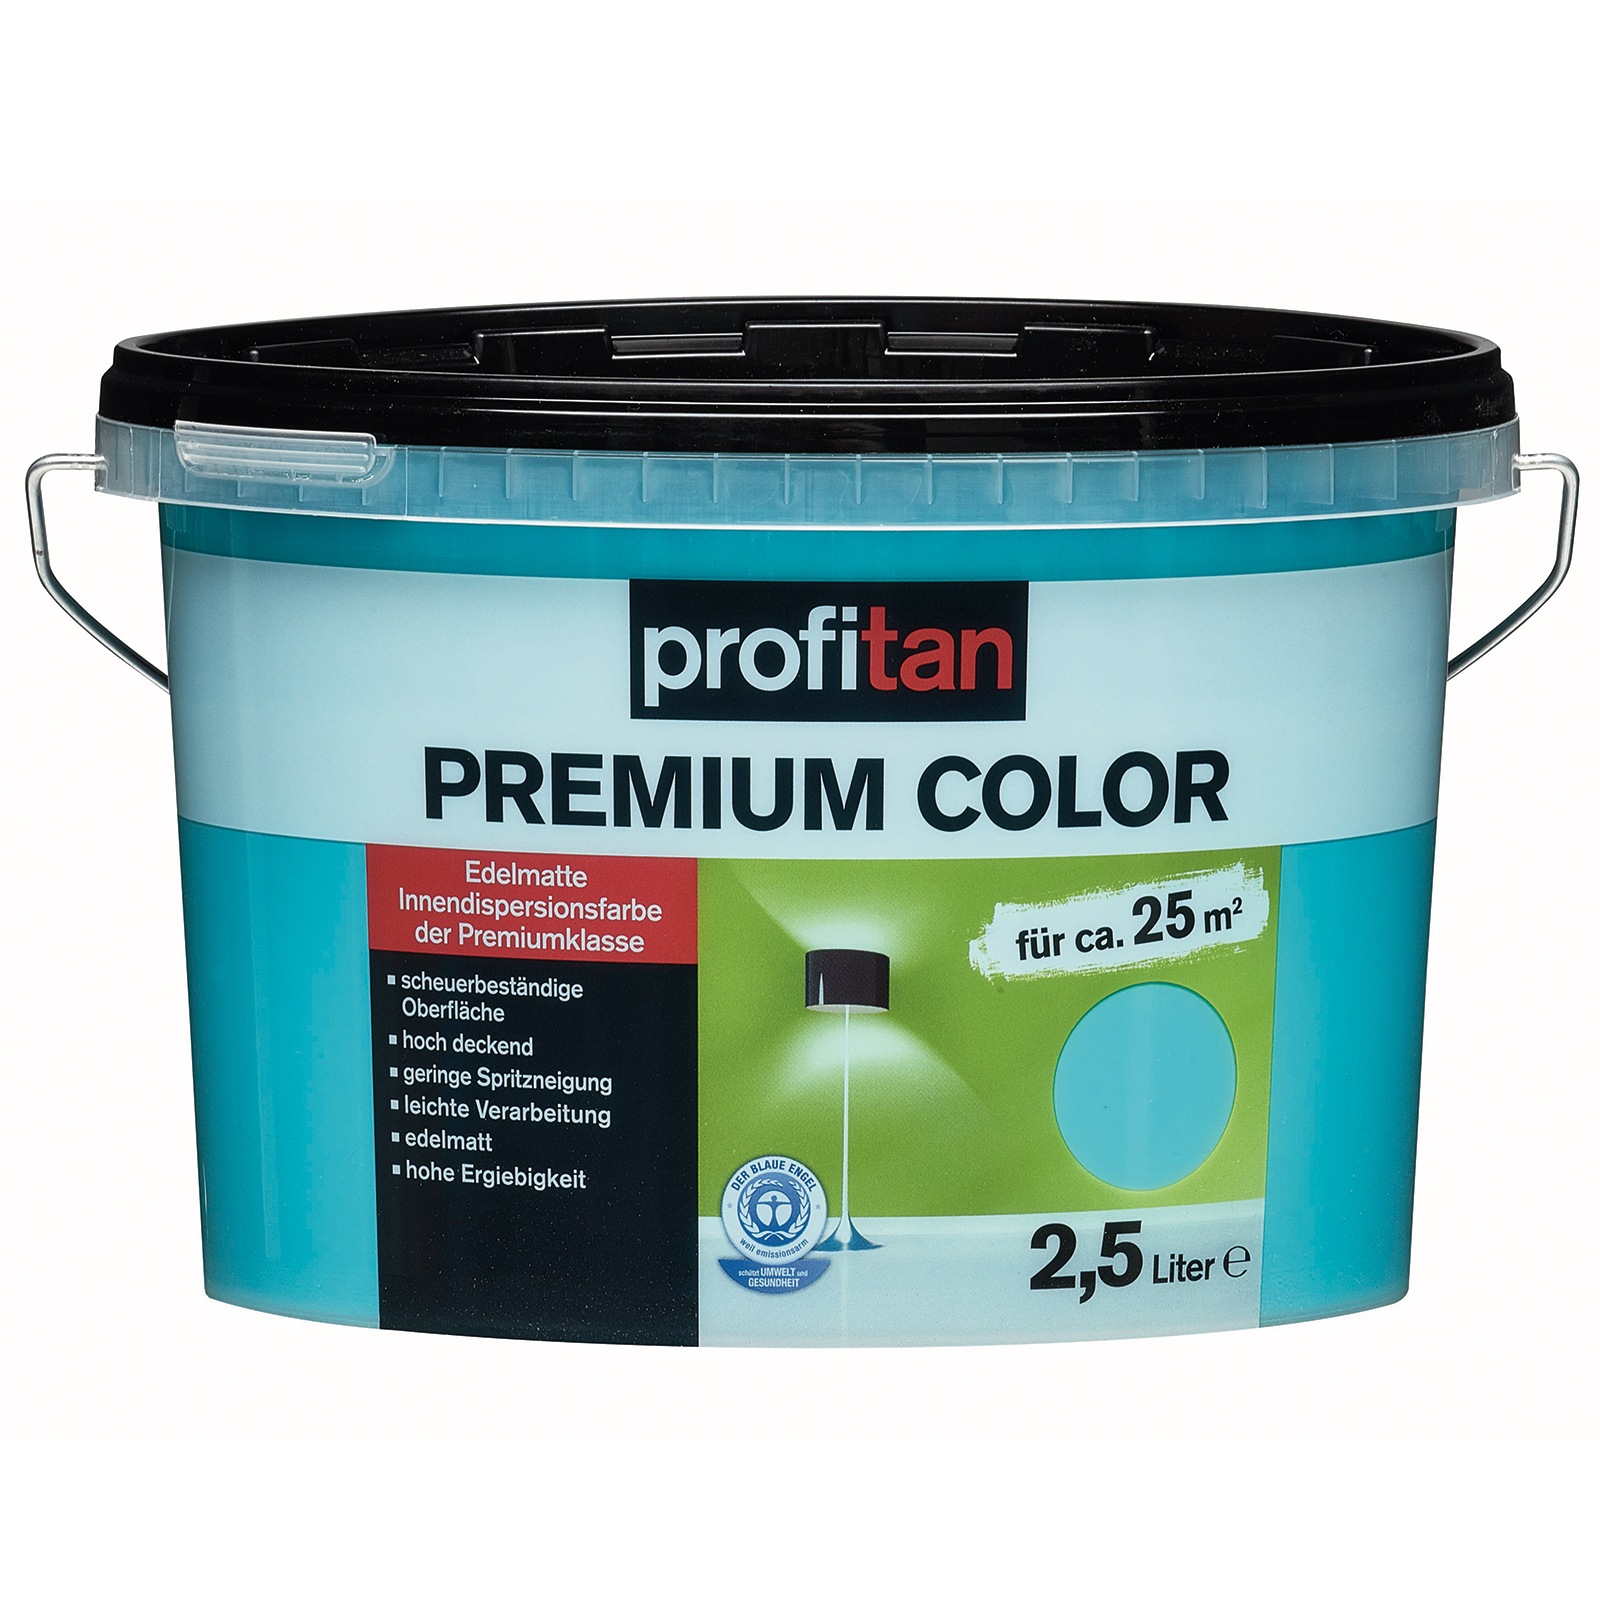 Profitan Wandfarbe Premium Color Blue Lagune Edelmatt 2 5 Liter Online Bei Roller Kaufen